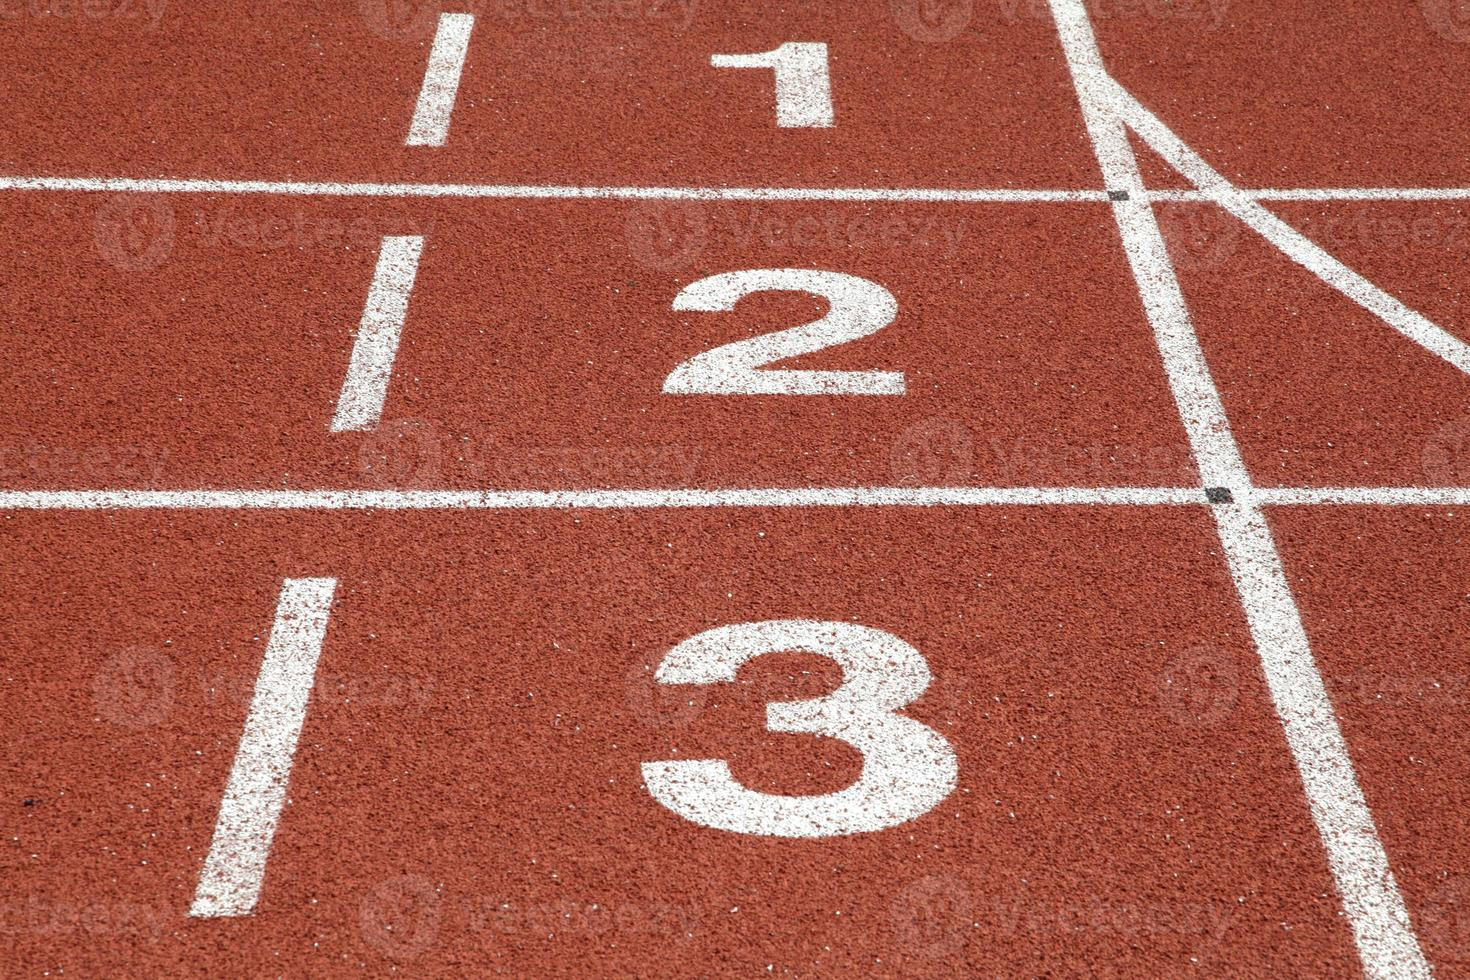 número 1 2 e 3 da pista de corrida foto